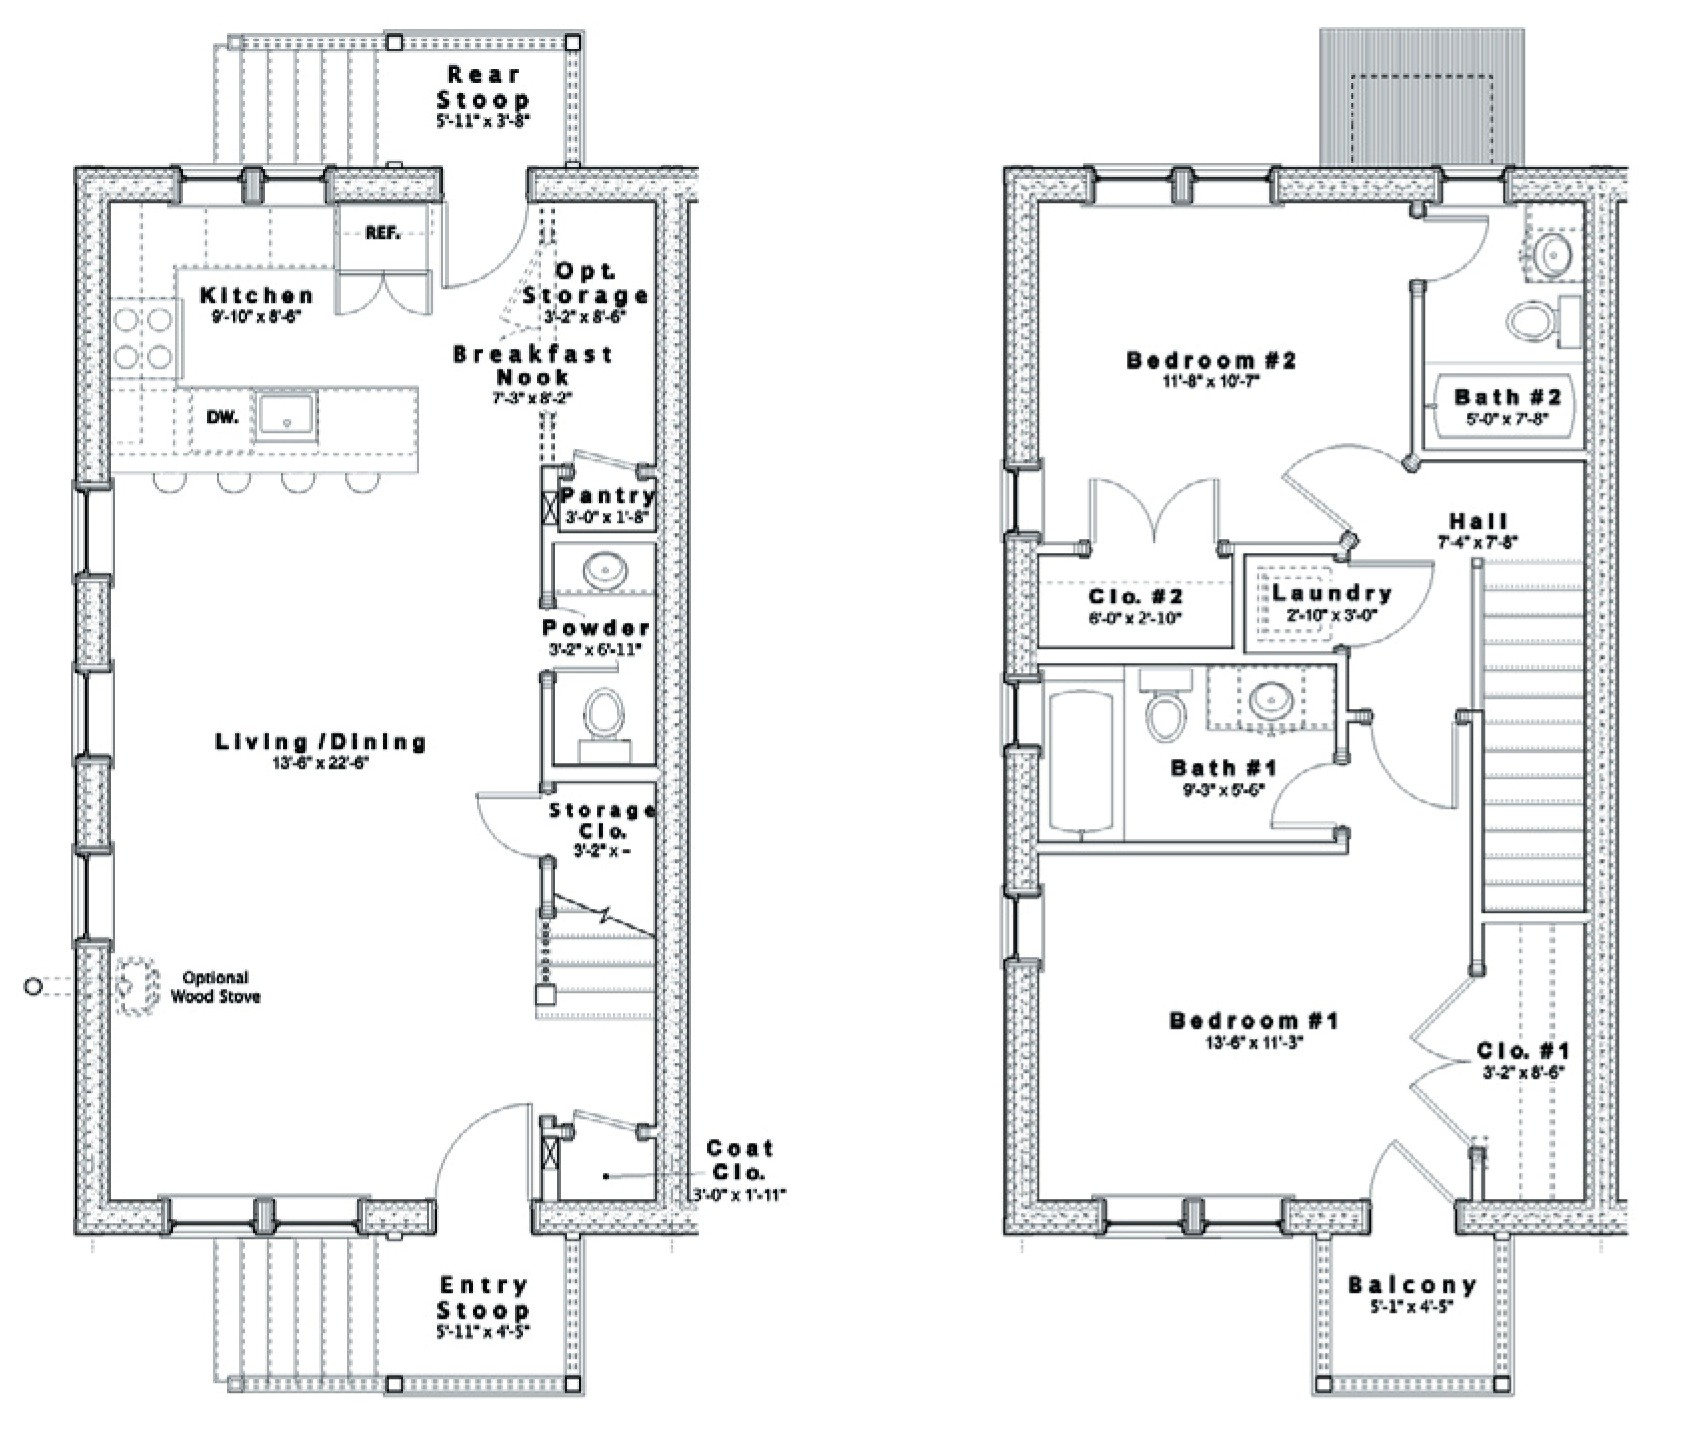 House Plans Duplex Plans Row Home: Row Home Floor Plan